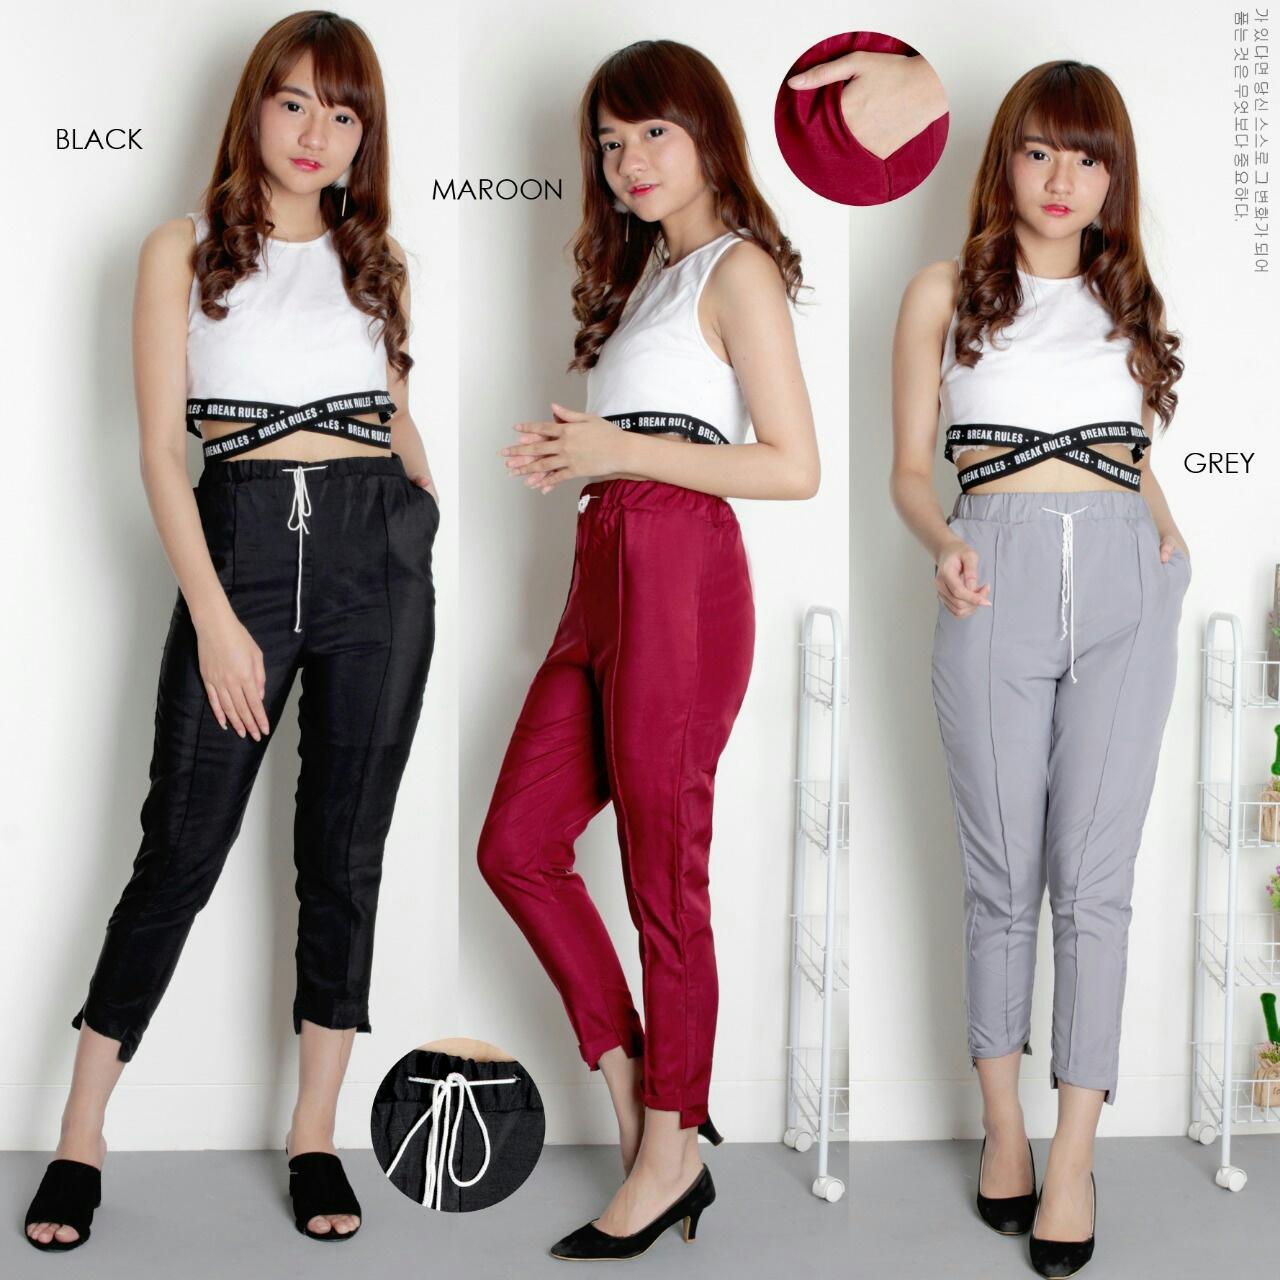 J&C Savero Pants / Celana Twistcone Wanita / Celana Wanita / Celana Bahan Twiscone / Celana Santai Wanita / Celana Kasual / Casual Pants